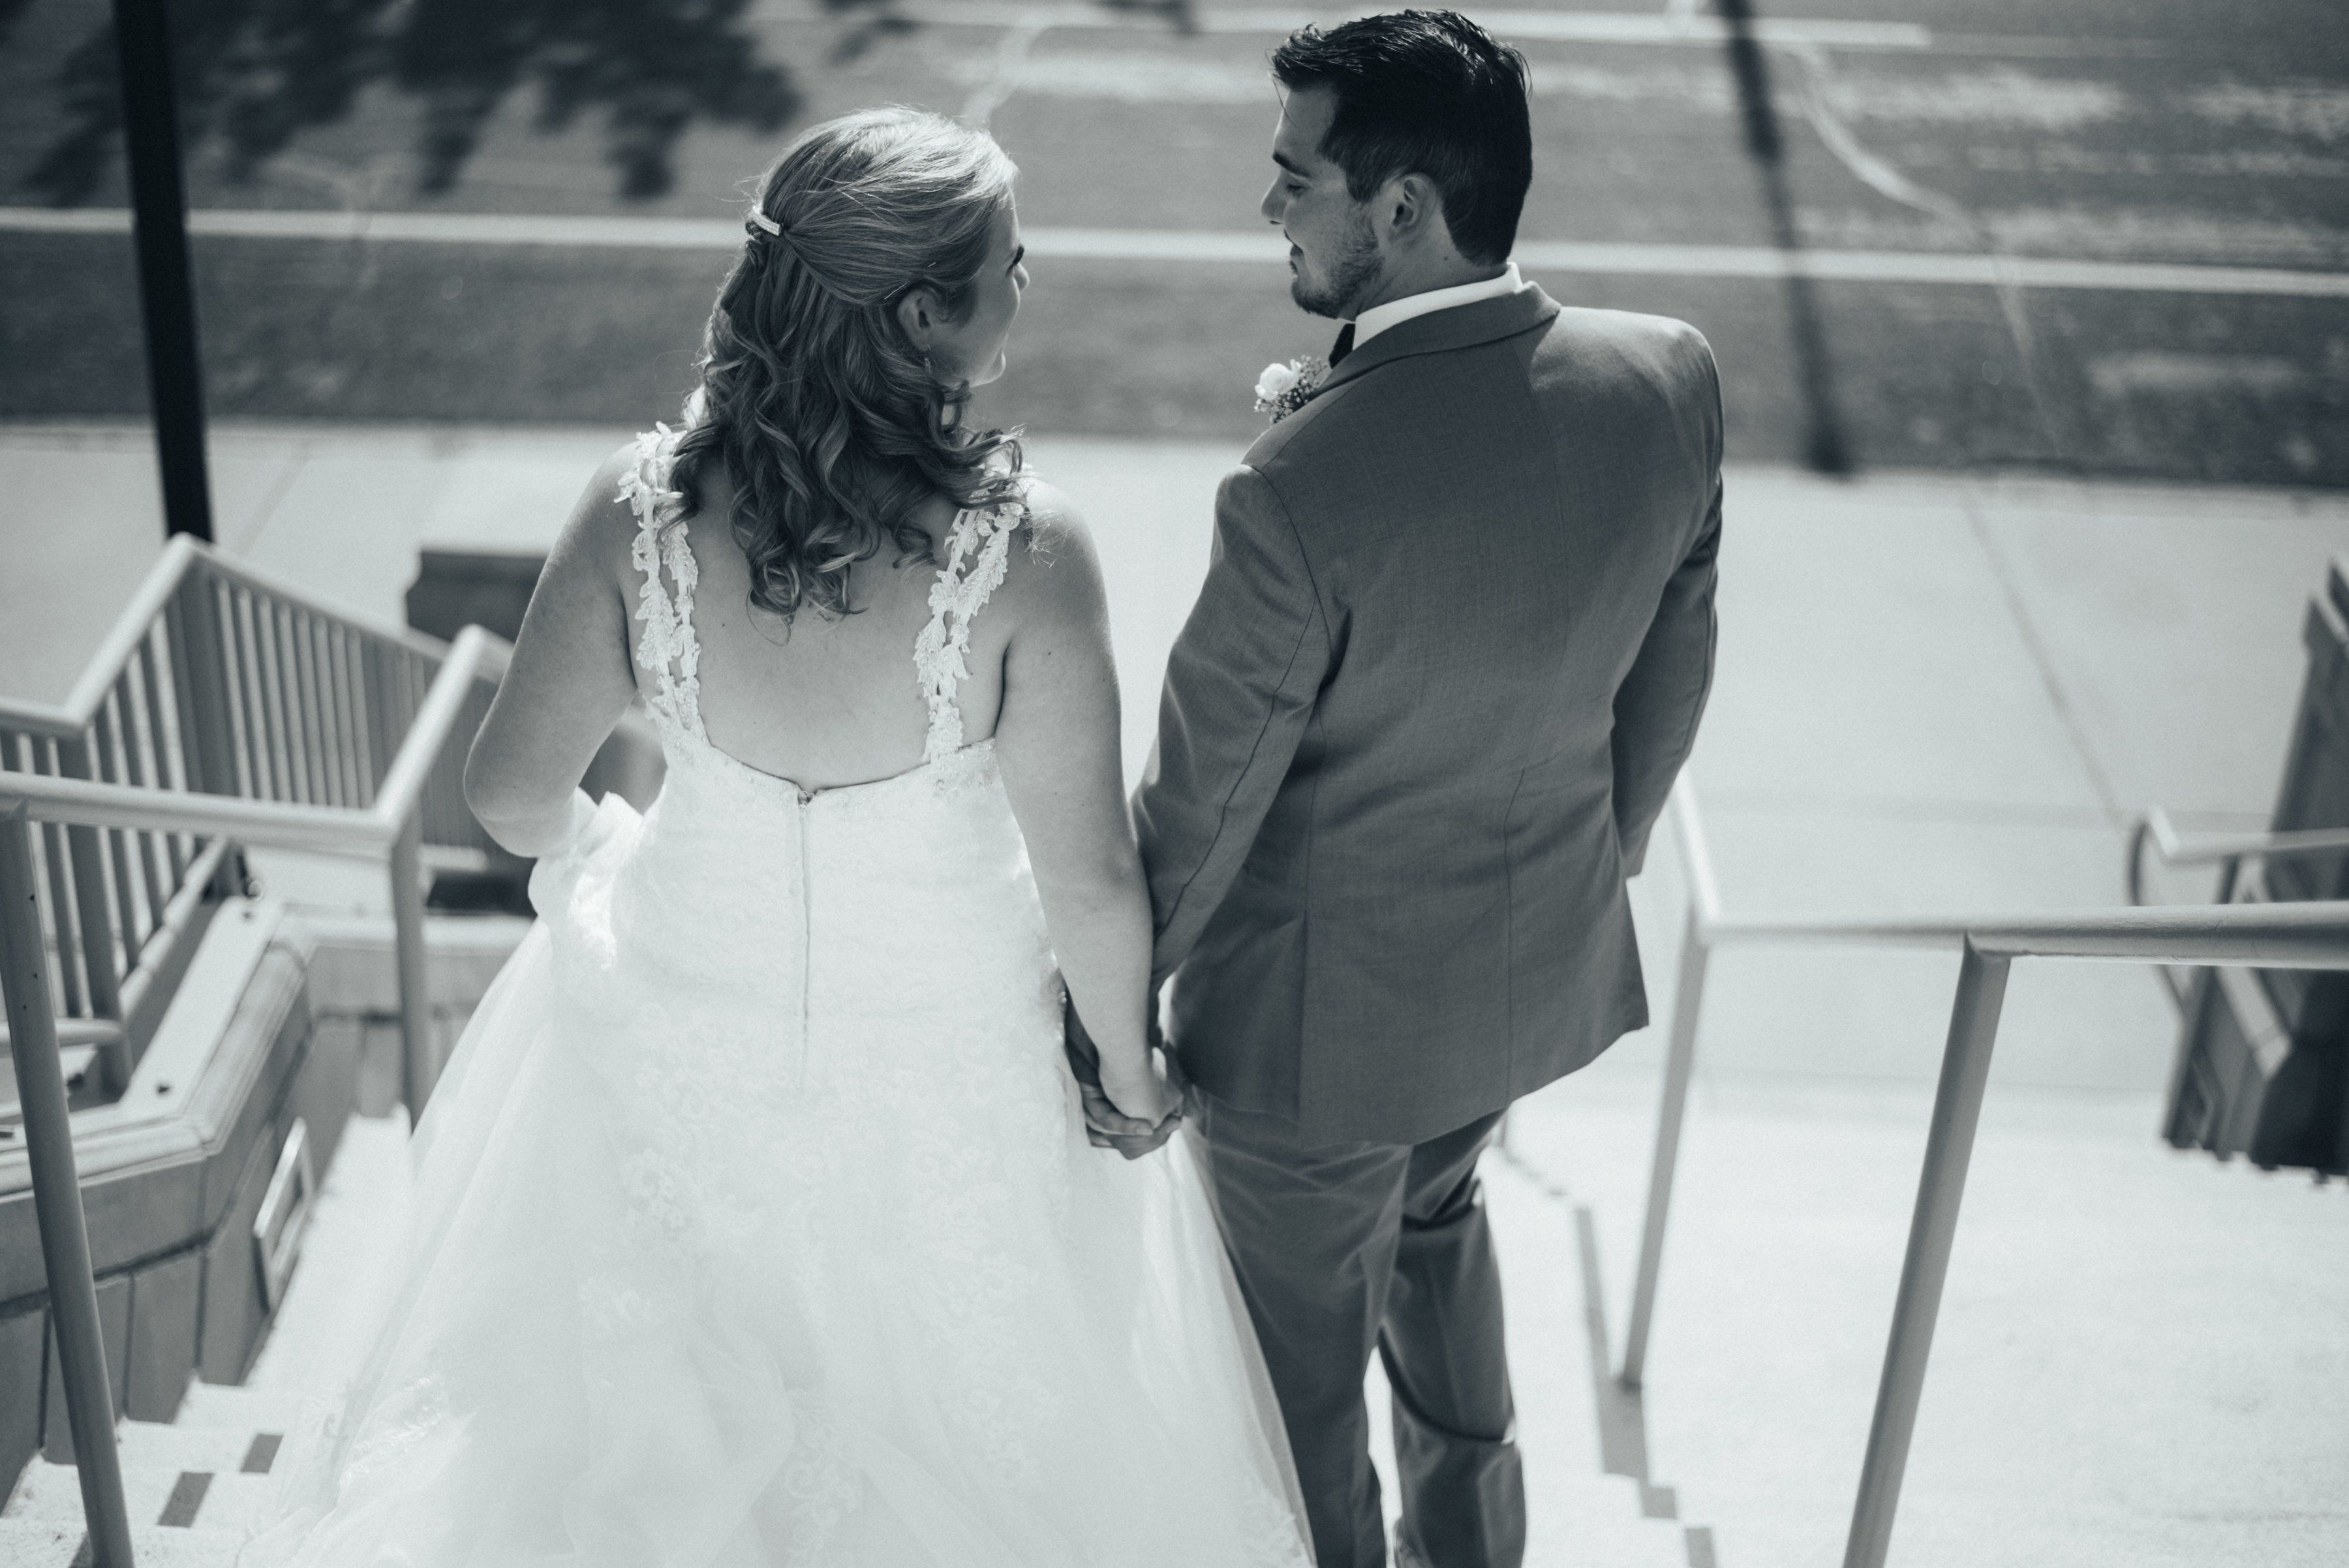 Wedding at First United Methodist Church in Denton, Texas